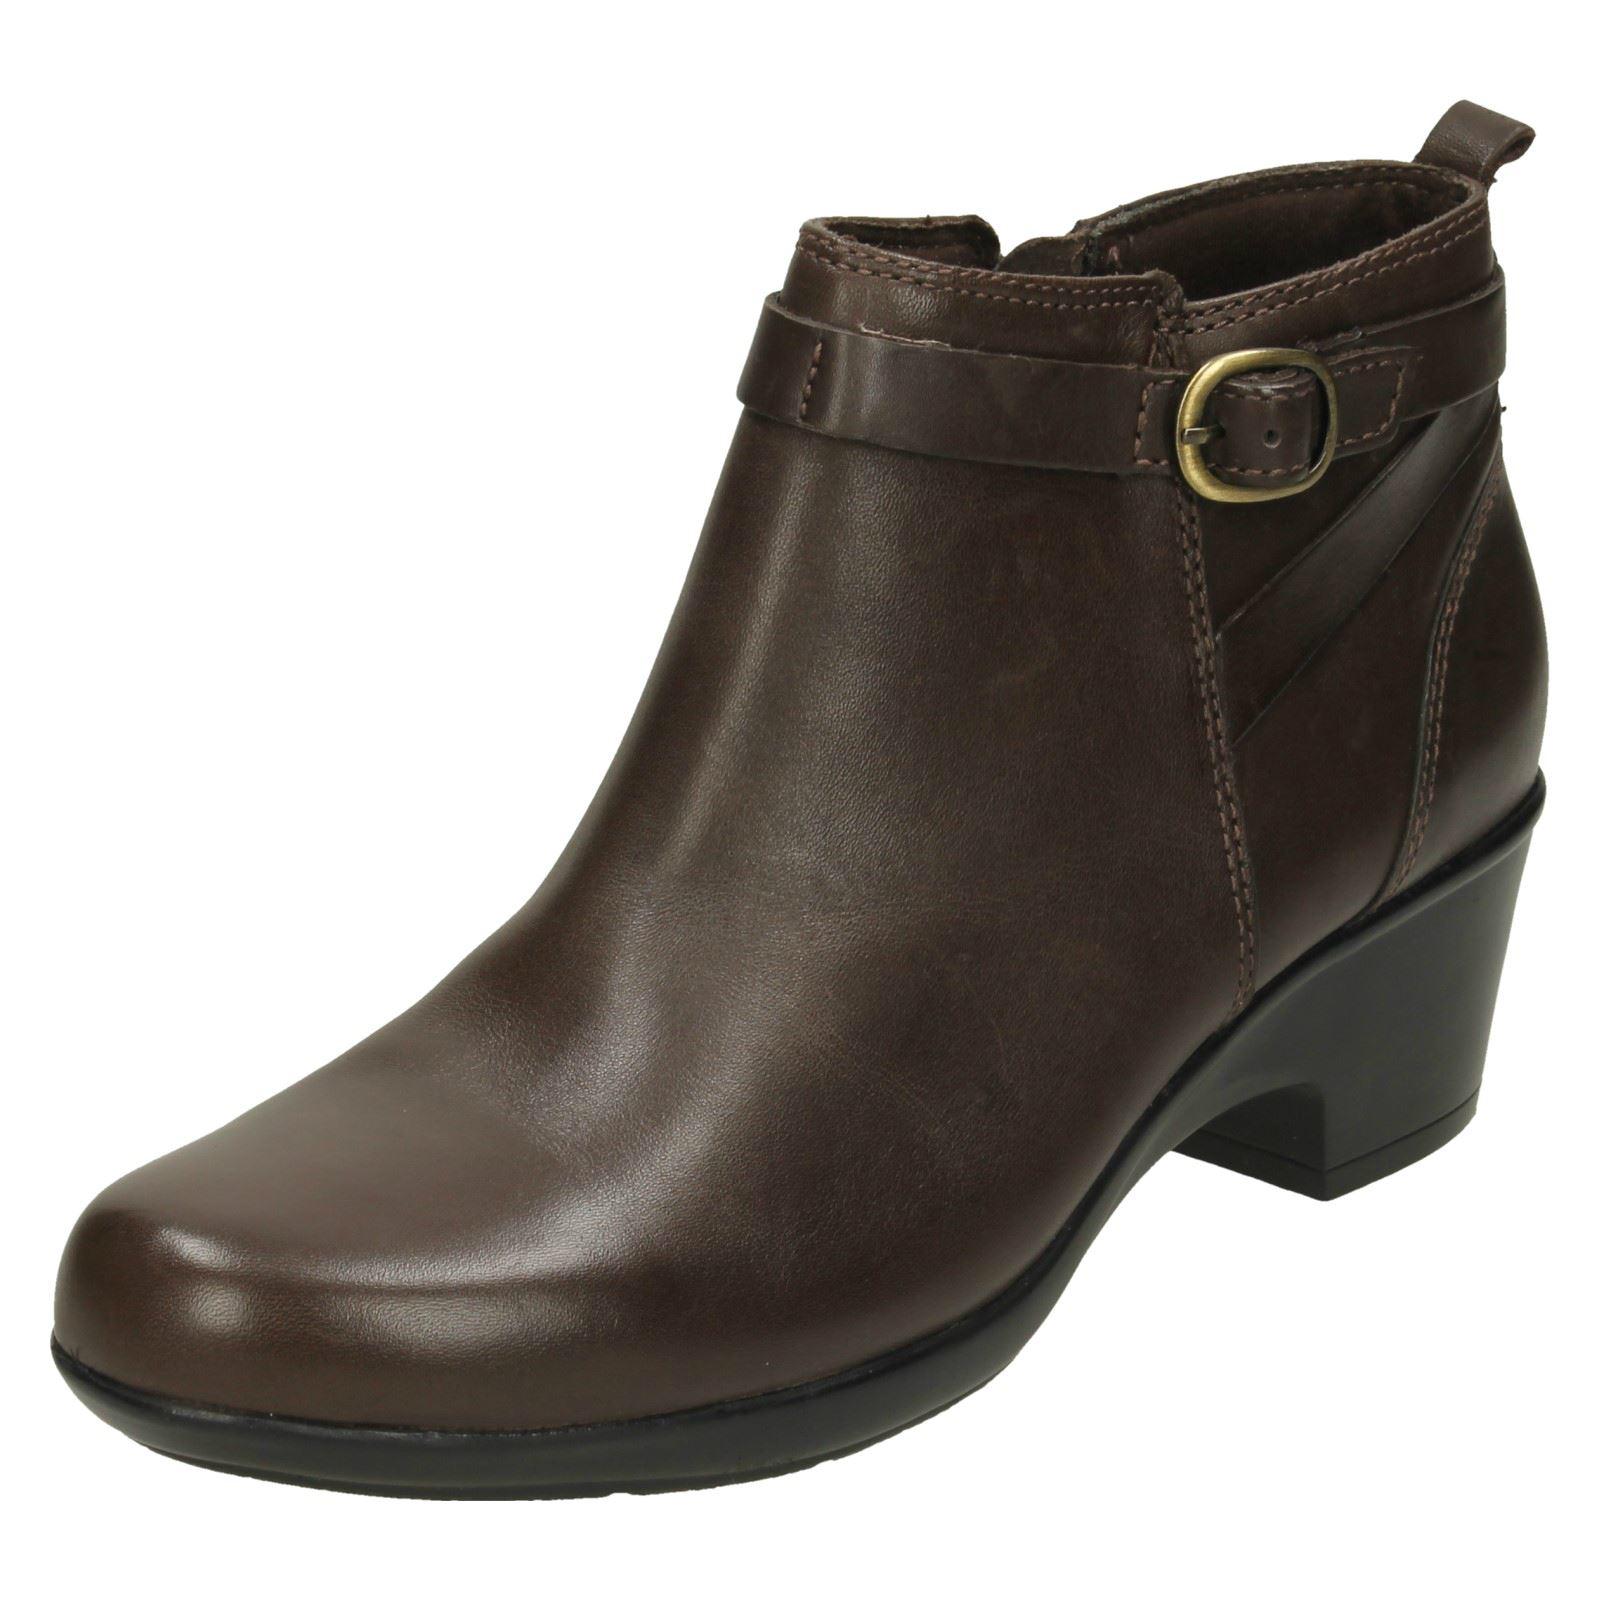 a208dc2e0d2c00 Ladies Clarks Low Heel Ankle BOOTS Malia Hawthorn UK 4.5 Brown E